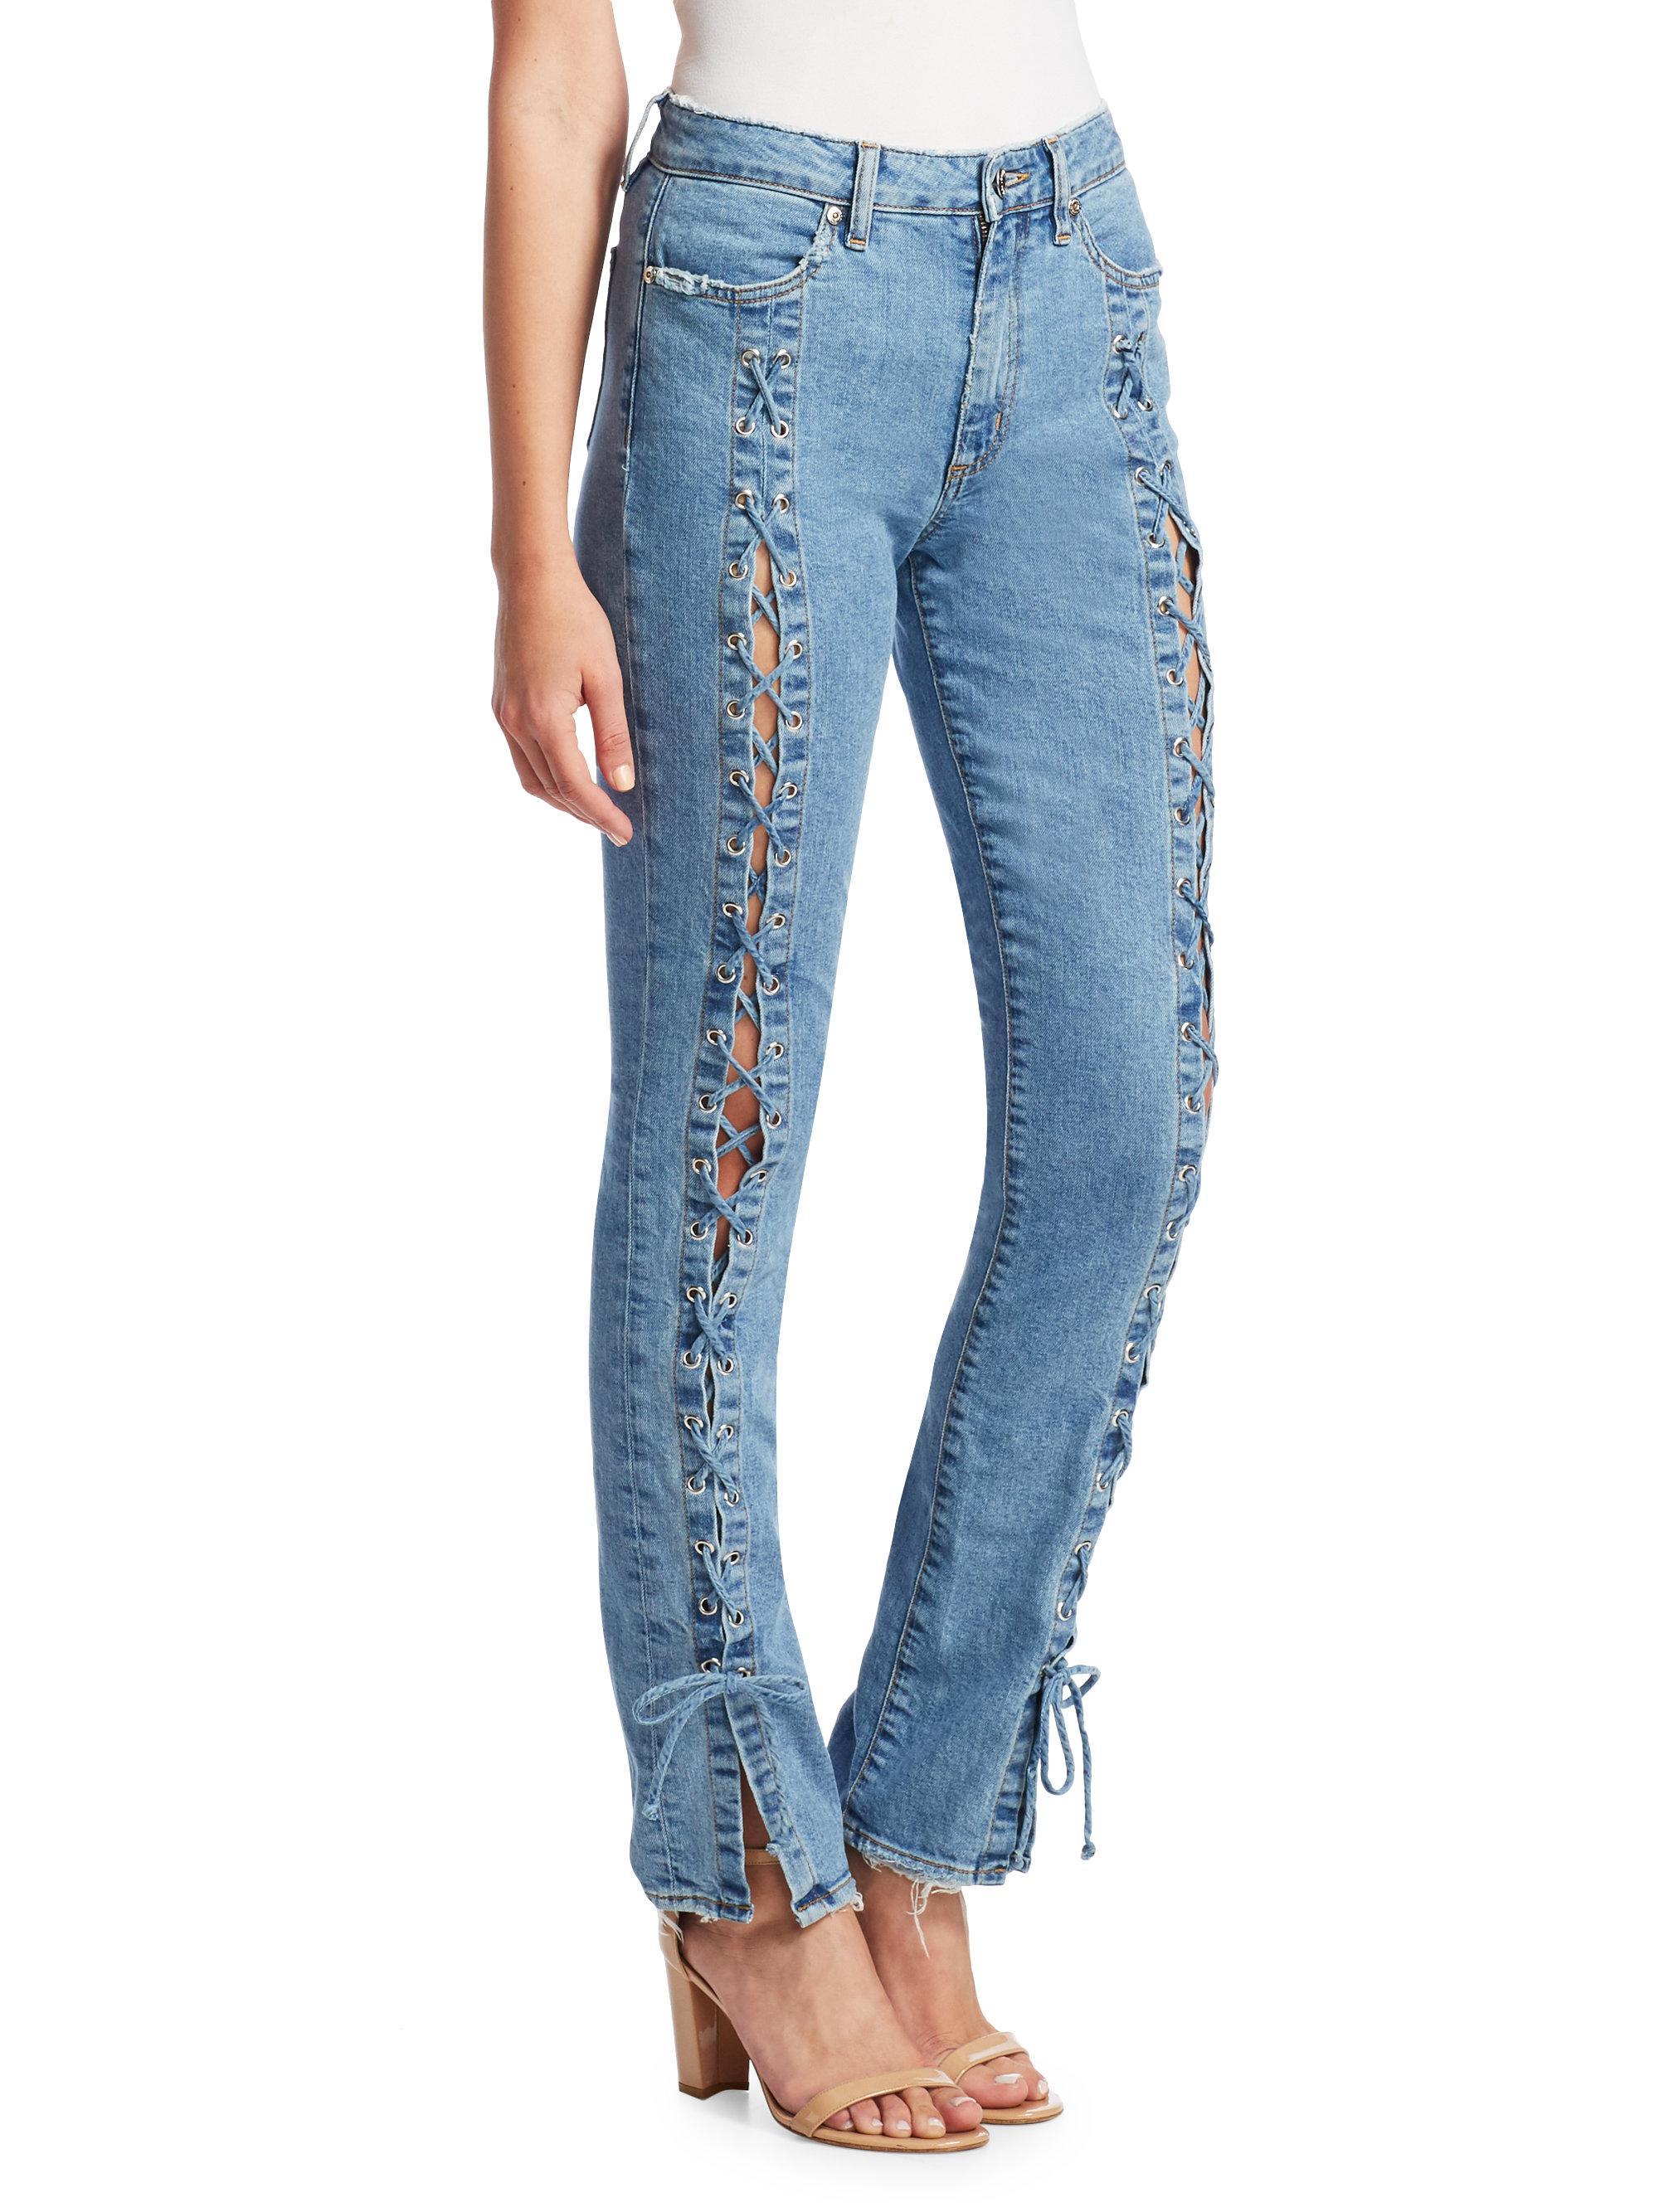 5ff3a0ba92c Lyst - Jonathan Simkhai Lace-up Denim Jeans in Blue